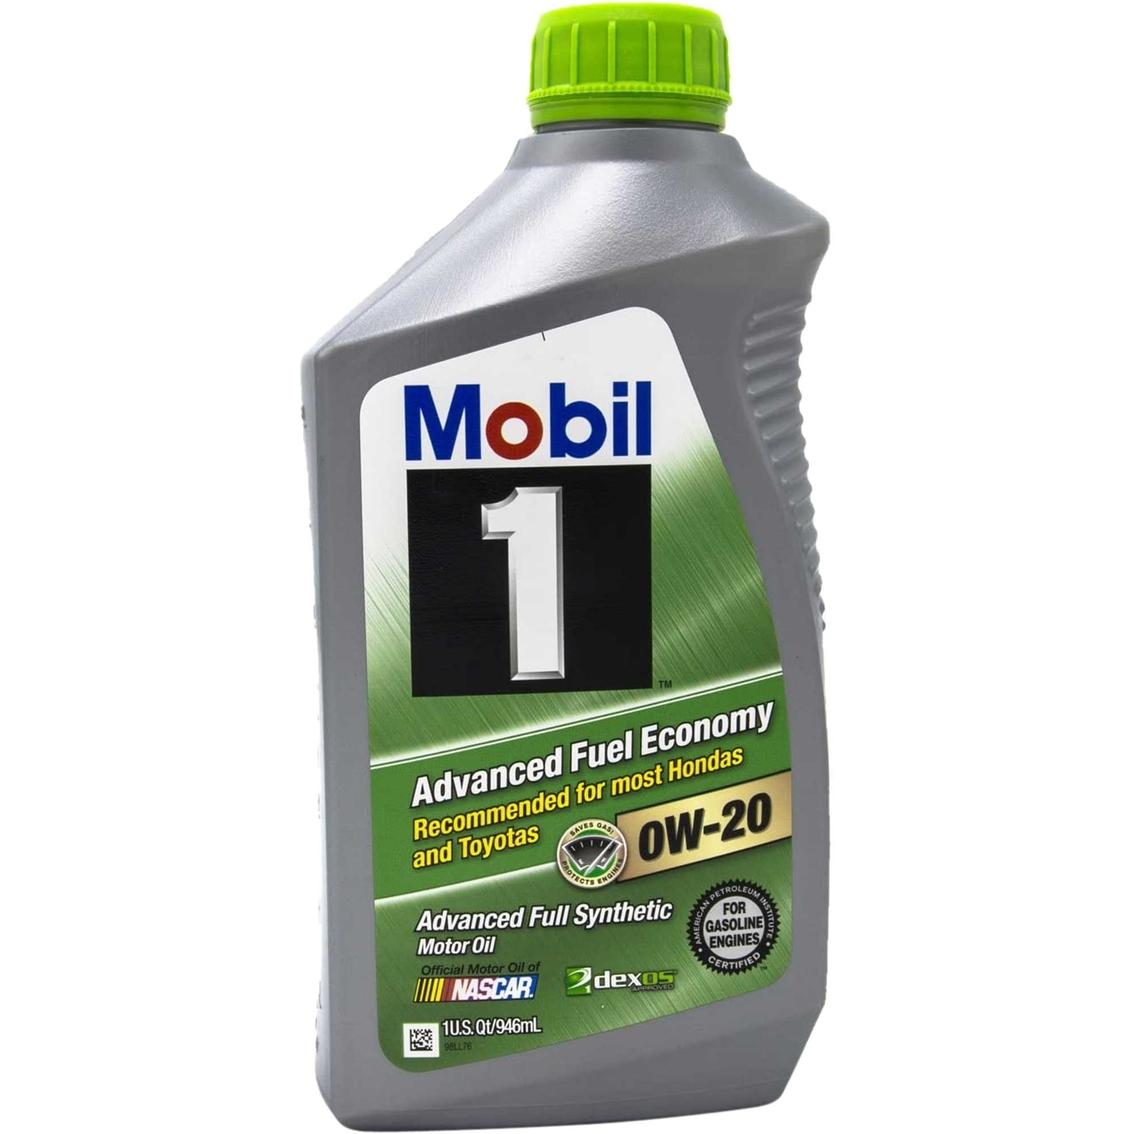 Info Harga Jack Lighter Male Mobil Terbaru 2018 Felixb Mens Singlet Fb 3103 Isi 1 Putih Xxl Advanced Fuel Economy 0w 20 Motor Oil Oils Fluids More